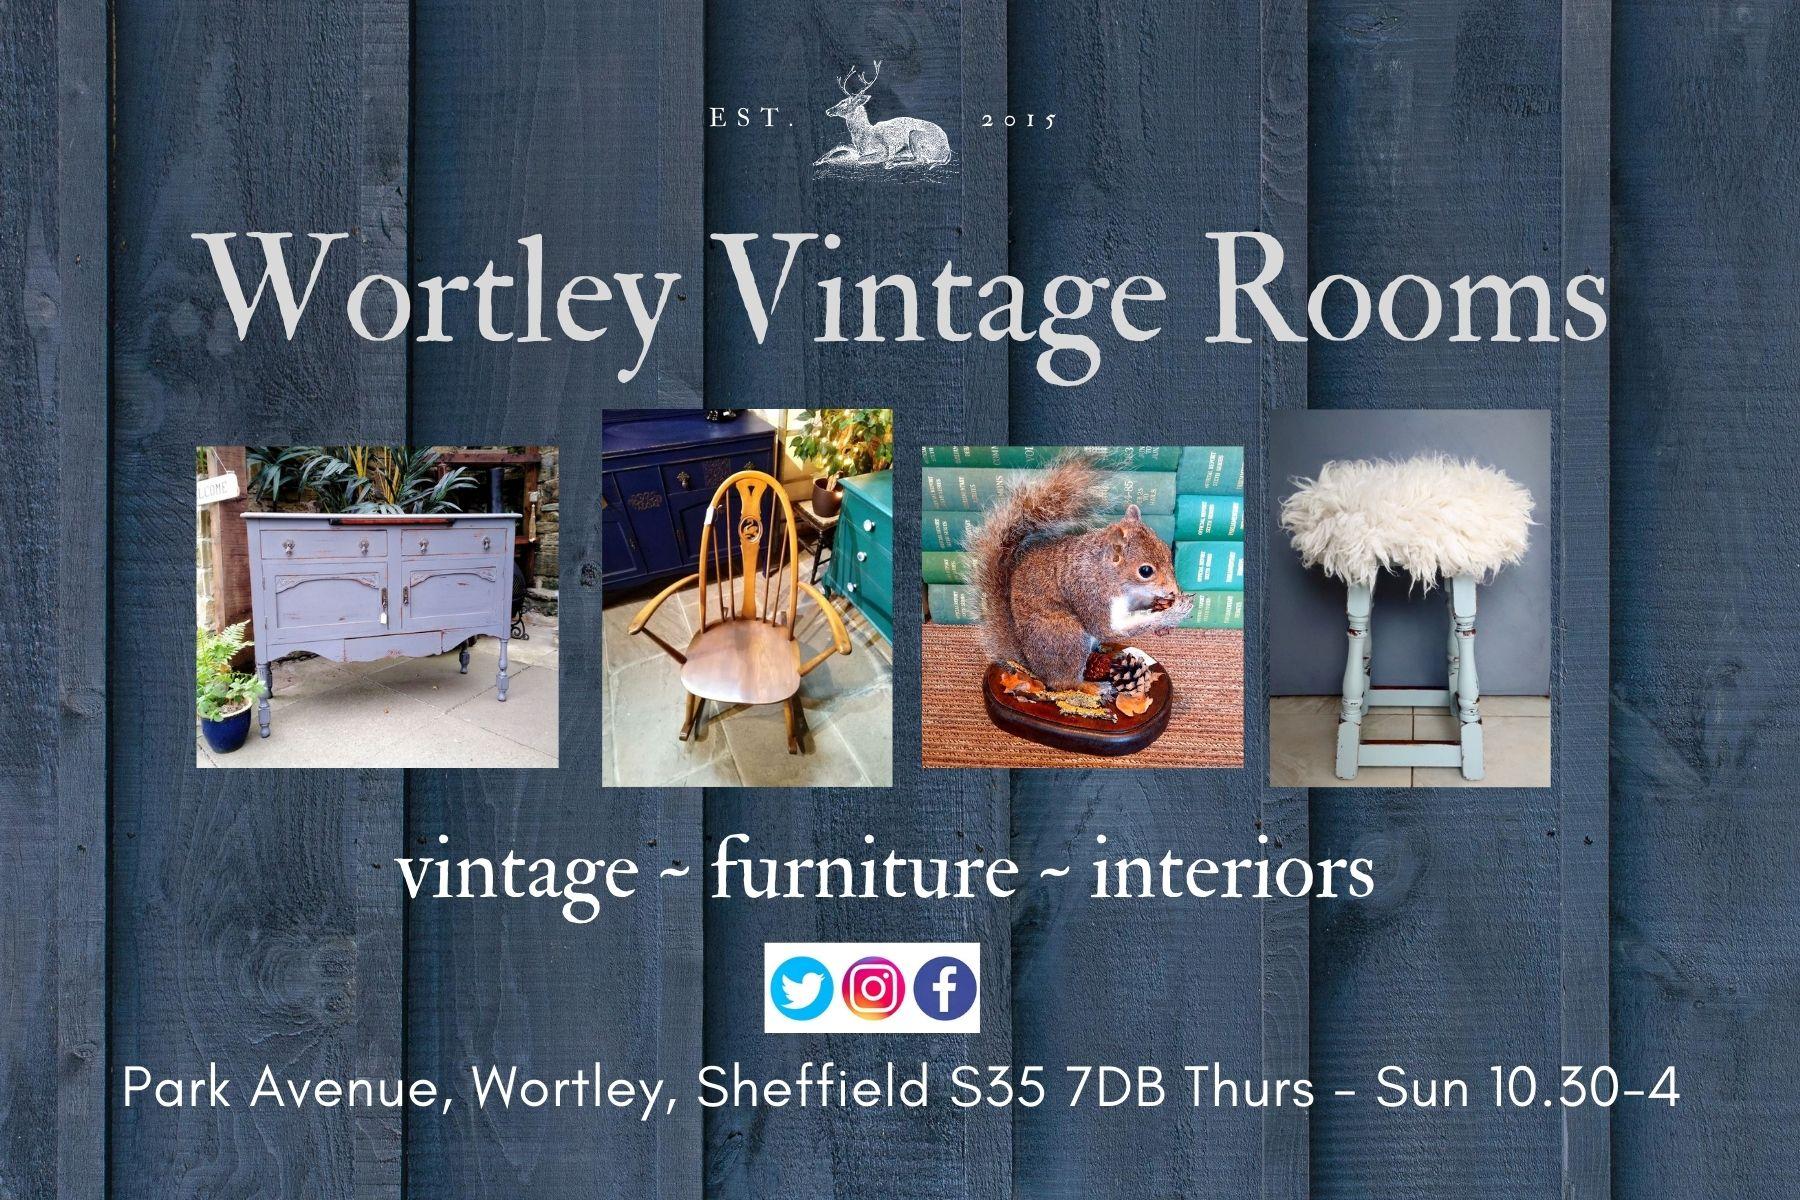 Wortley Vintage Rooms